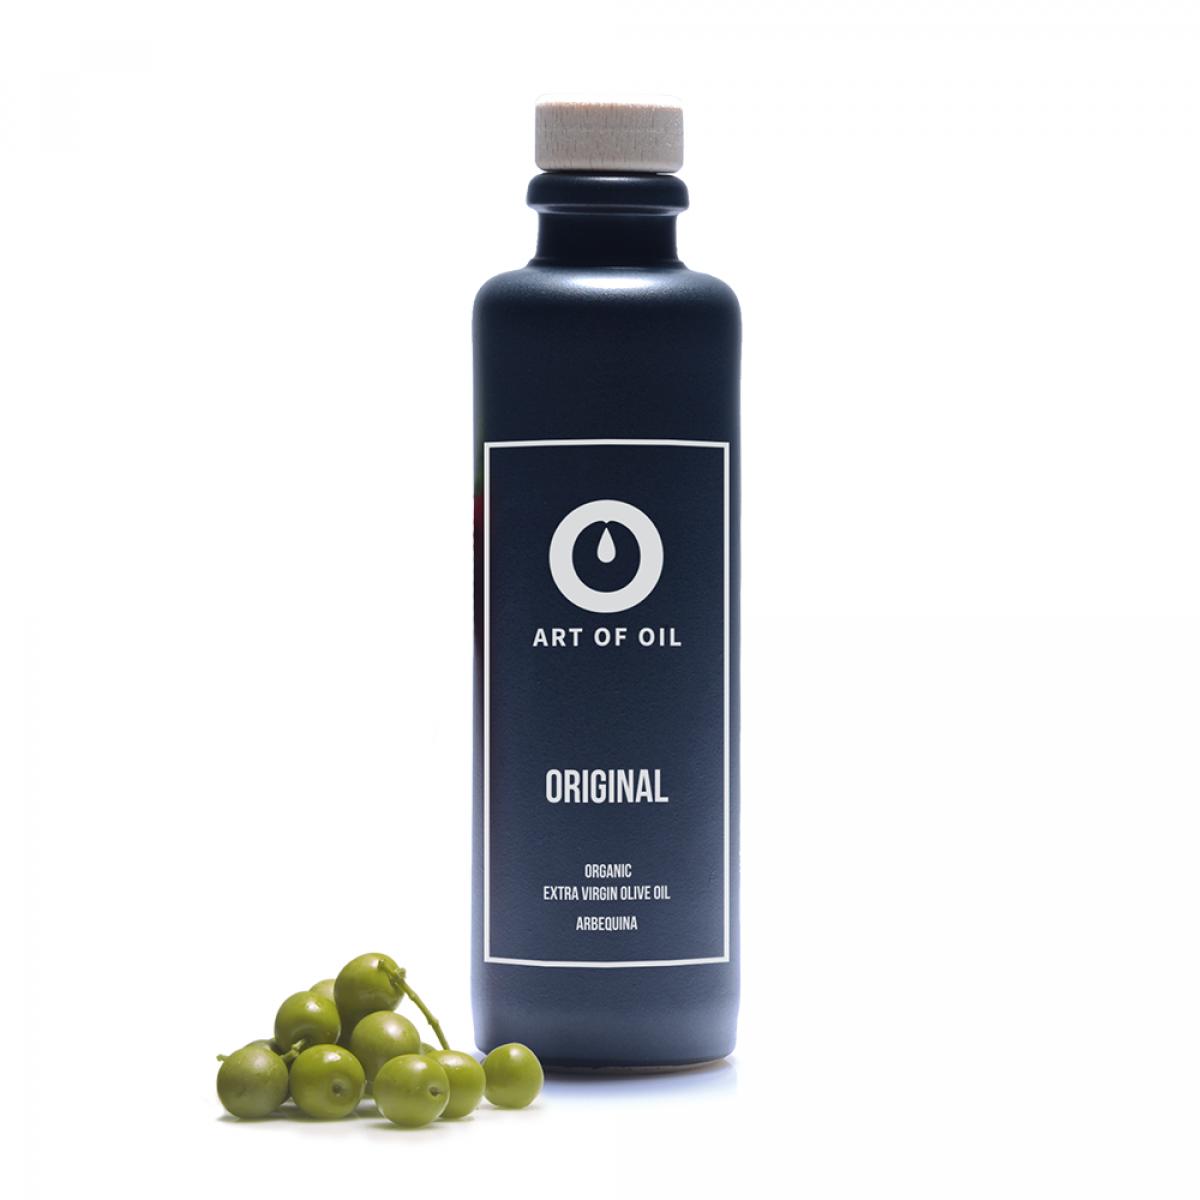 ART OF OIL Biologisches Extra Virgin Olivenöl - Original (200ml)